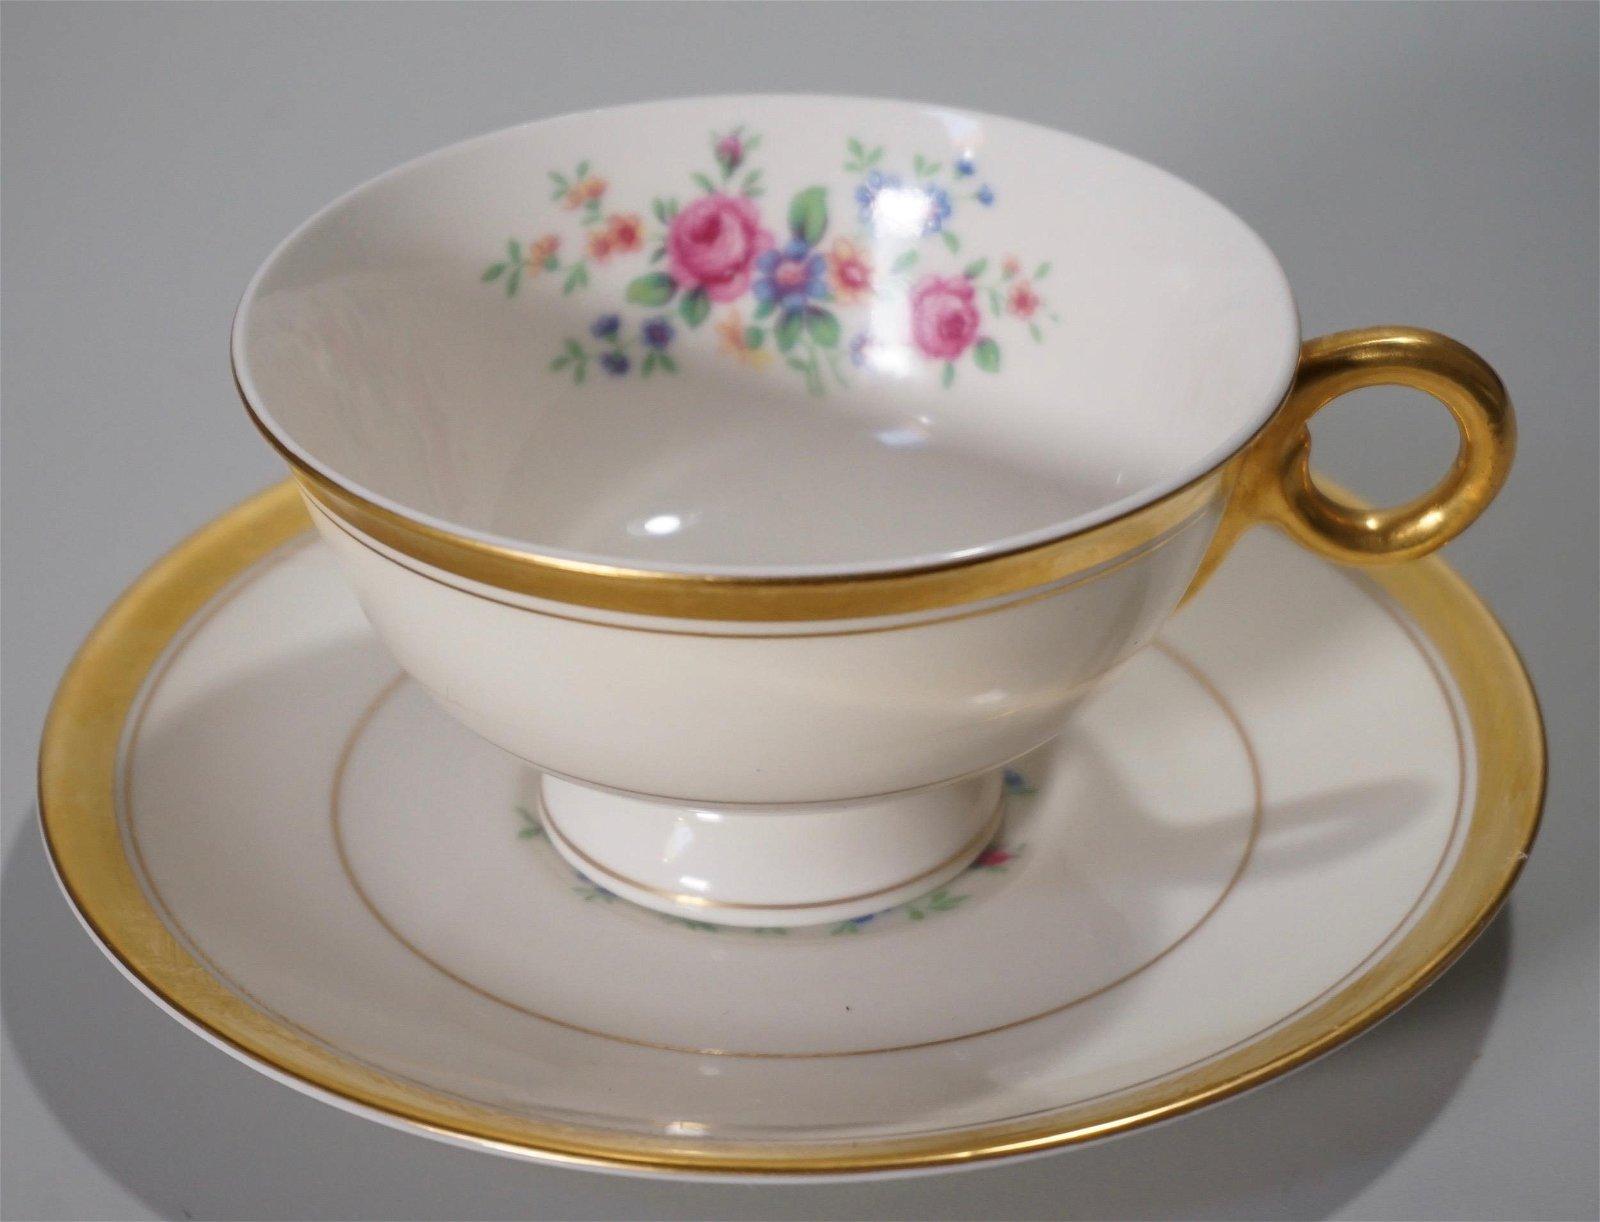 Theodore Haviland Teacup Saucer Set Vintage China